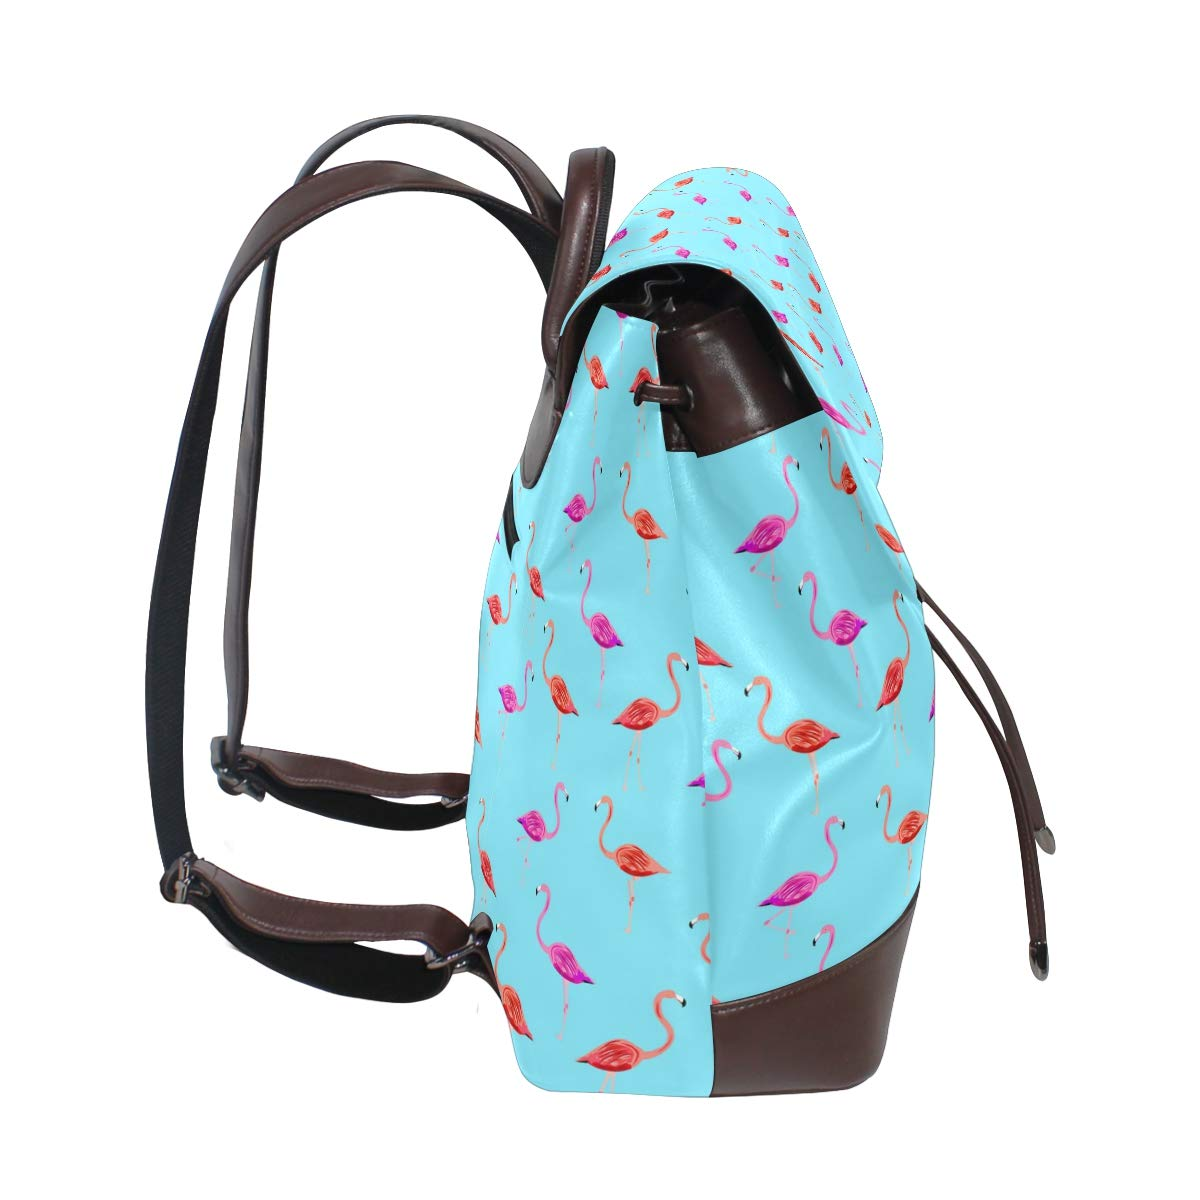 Leather Flamingo Pattern Background Blue Backpack Daypack Bag Women